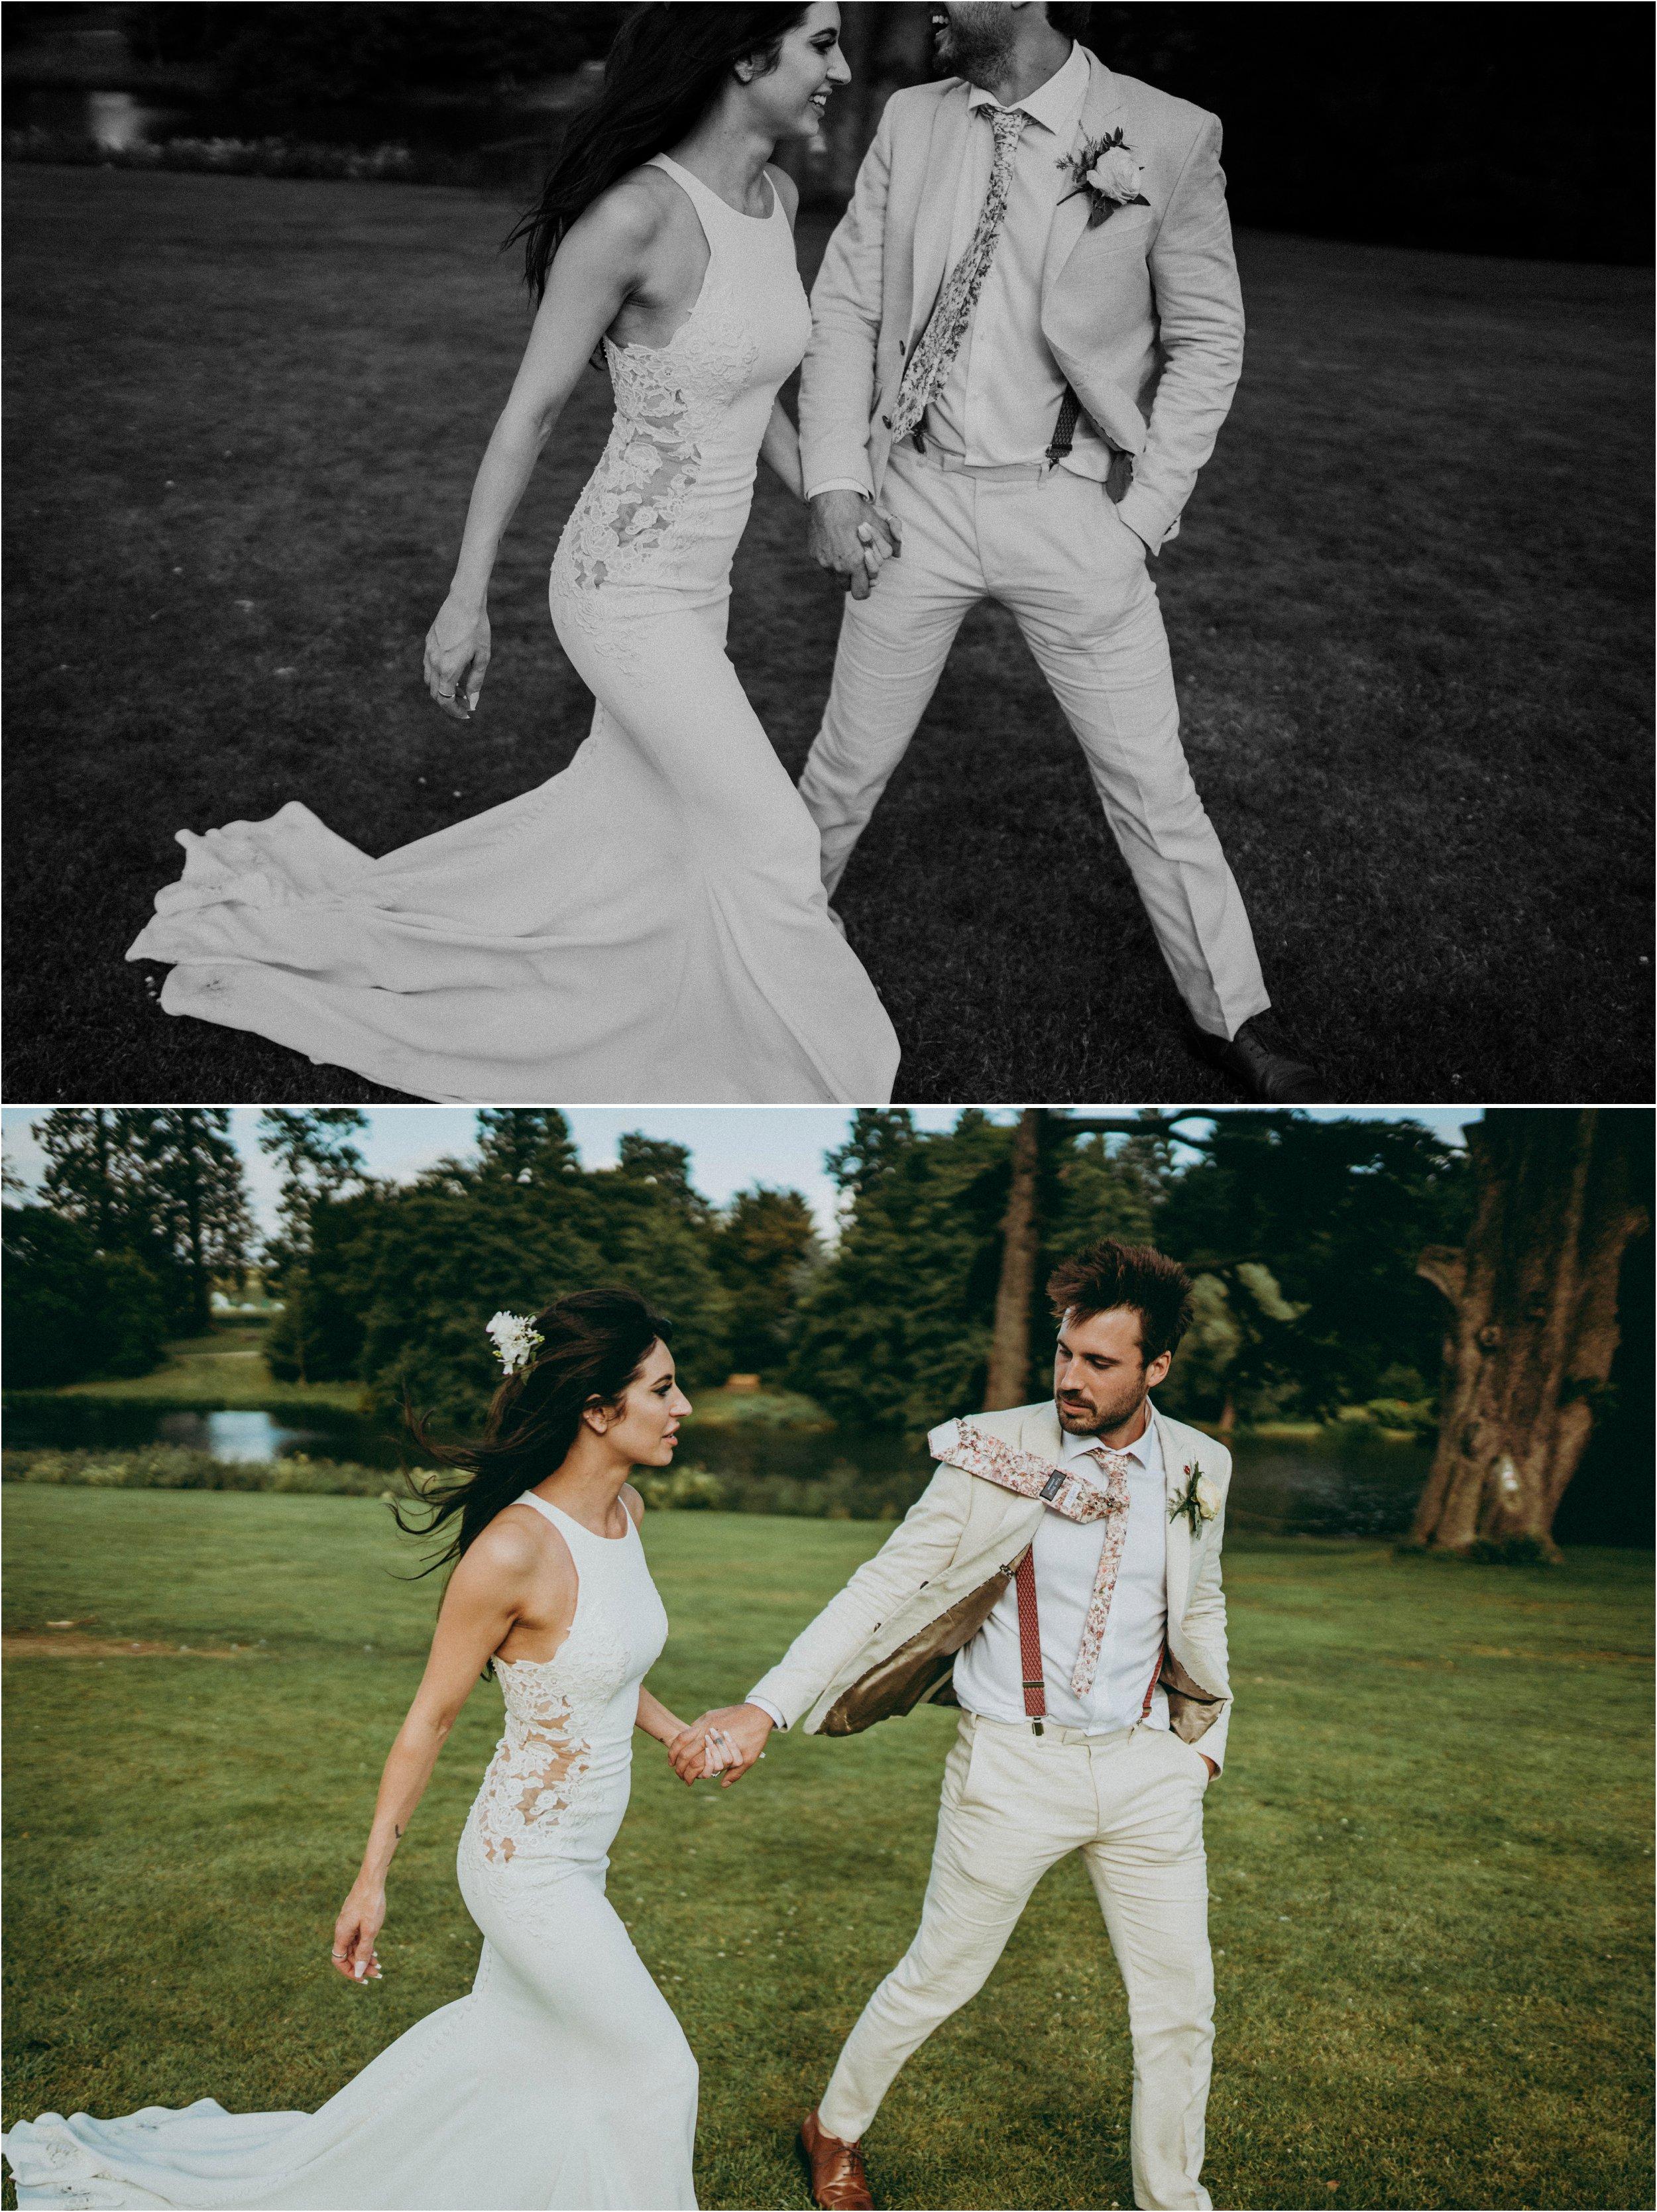 Compton Verney wedding photography_0141.jpg